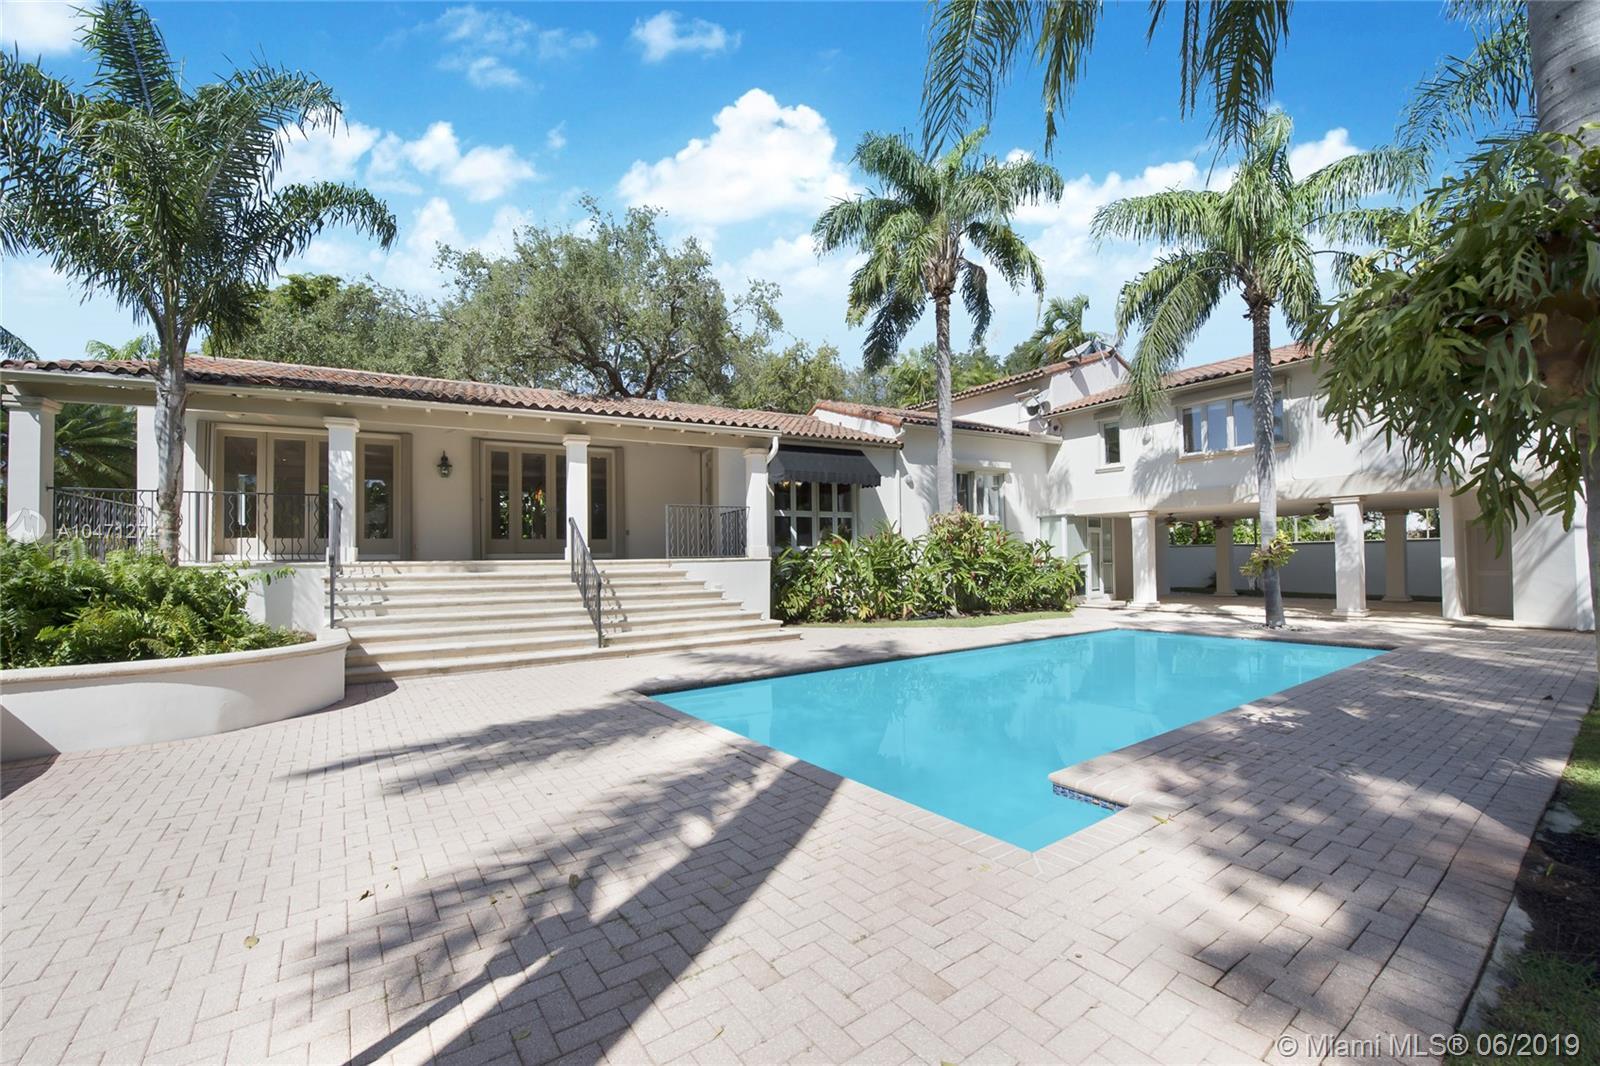 7423 VISTALMAR ST, South Miami, Florida